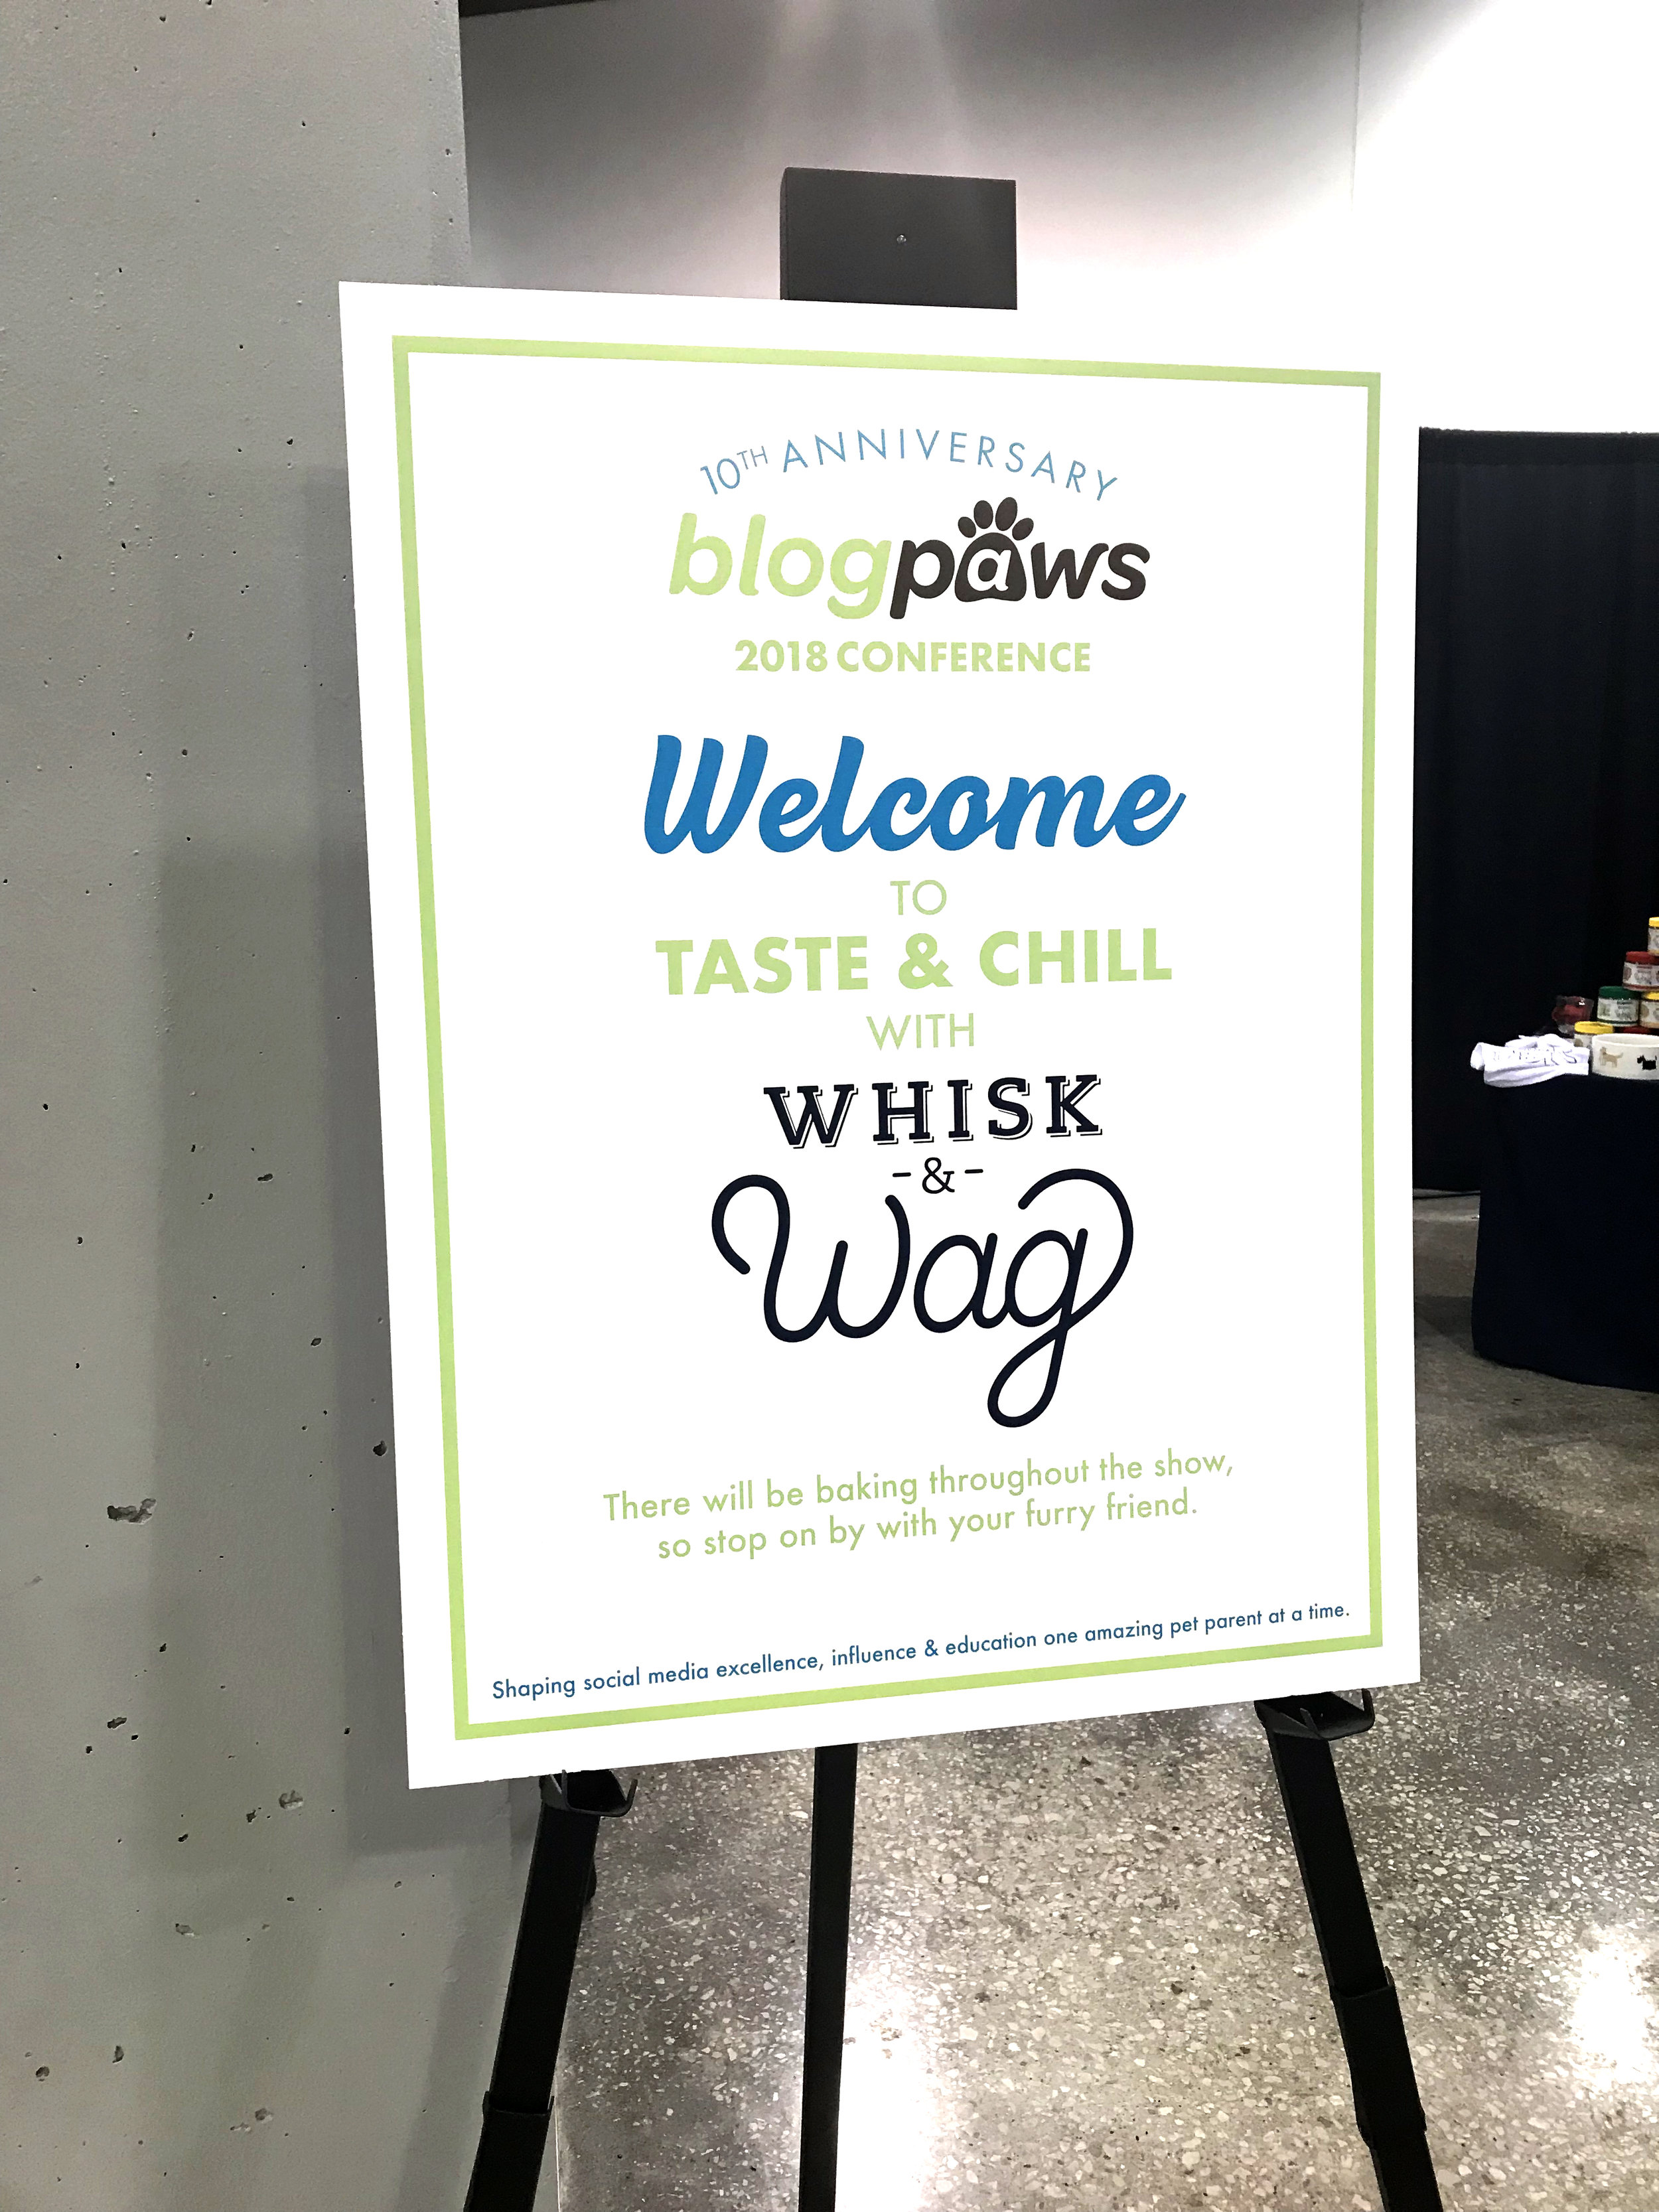 Whisk & Wag at BlogPaws